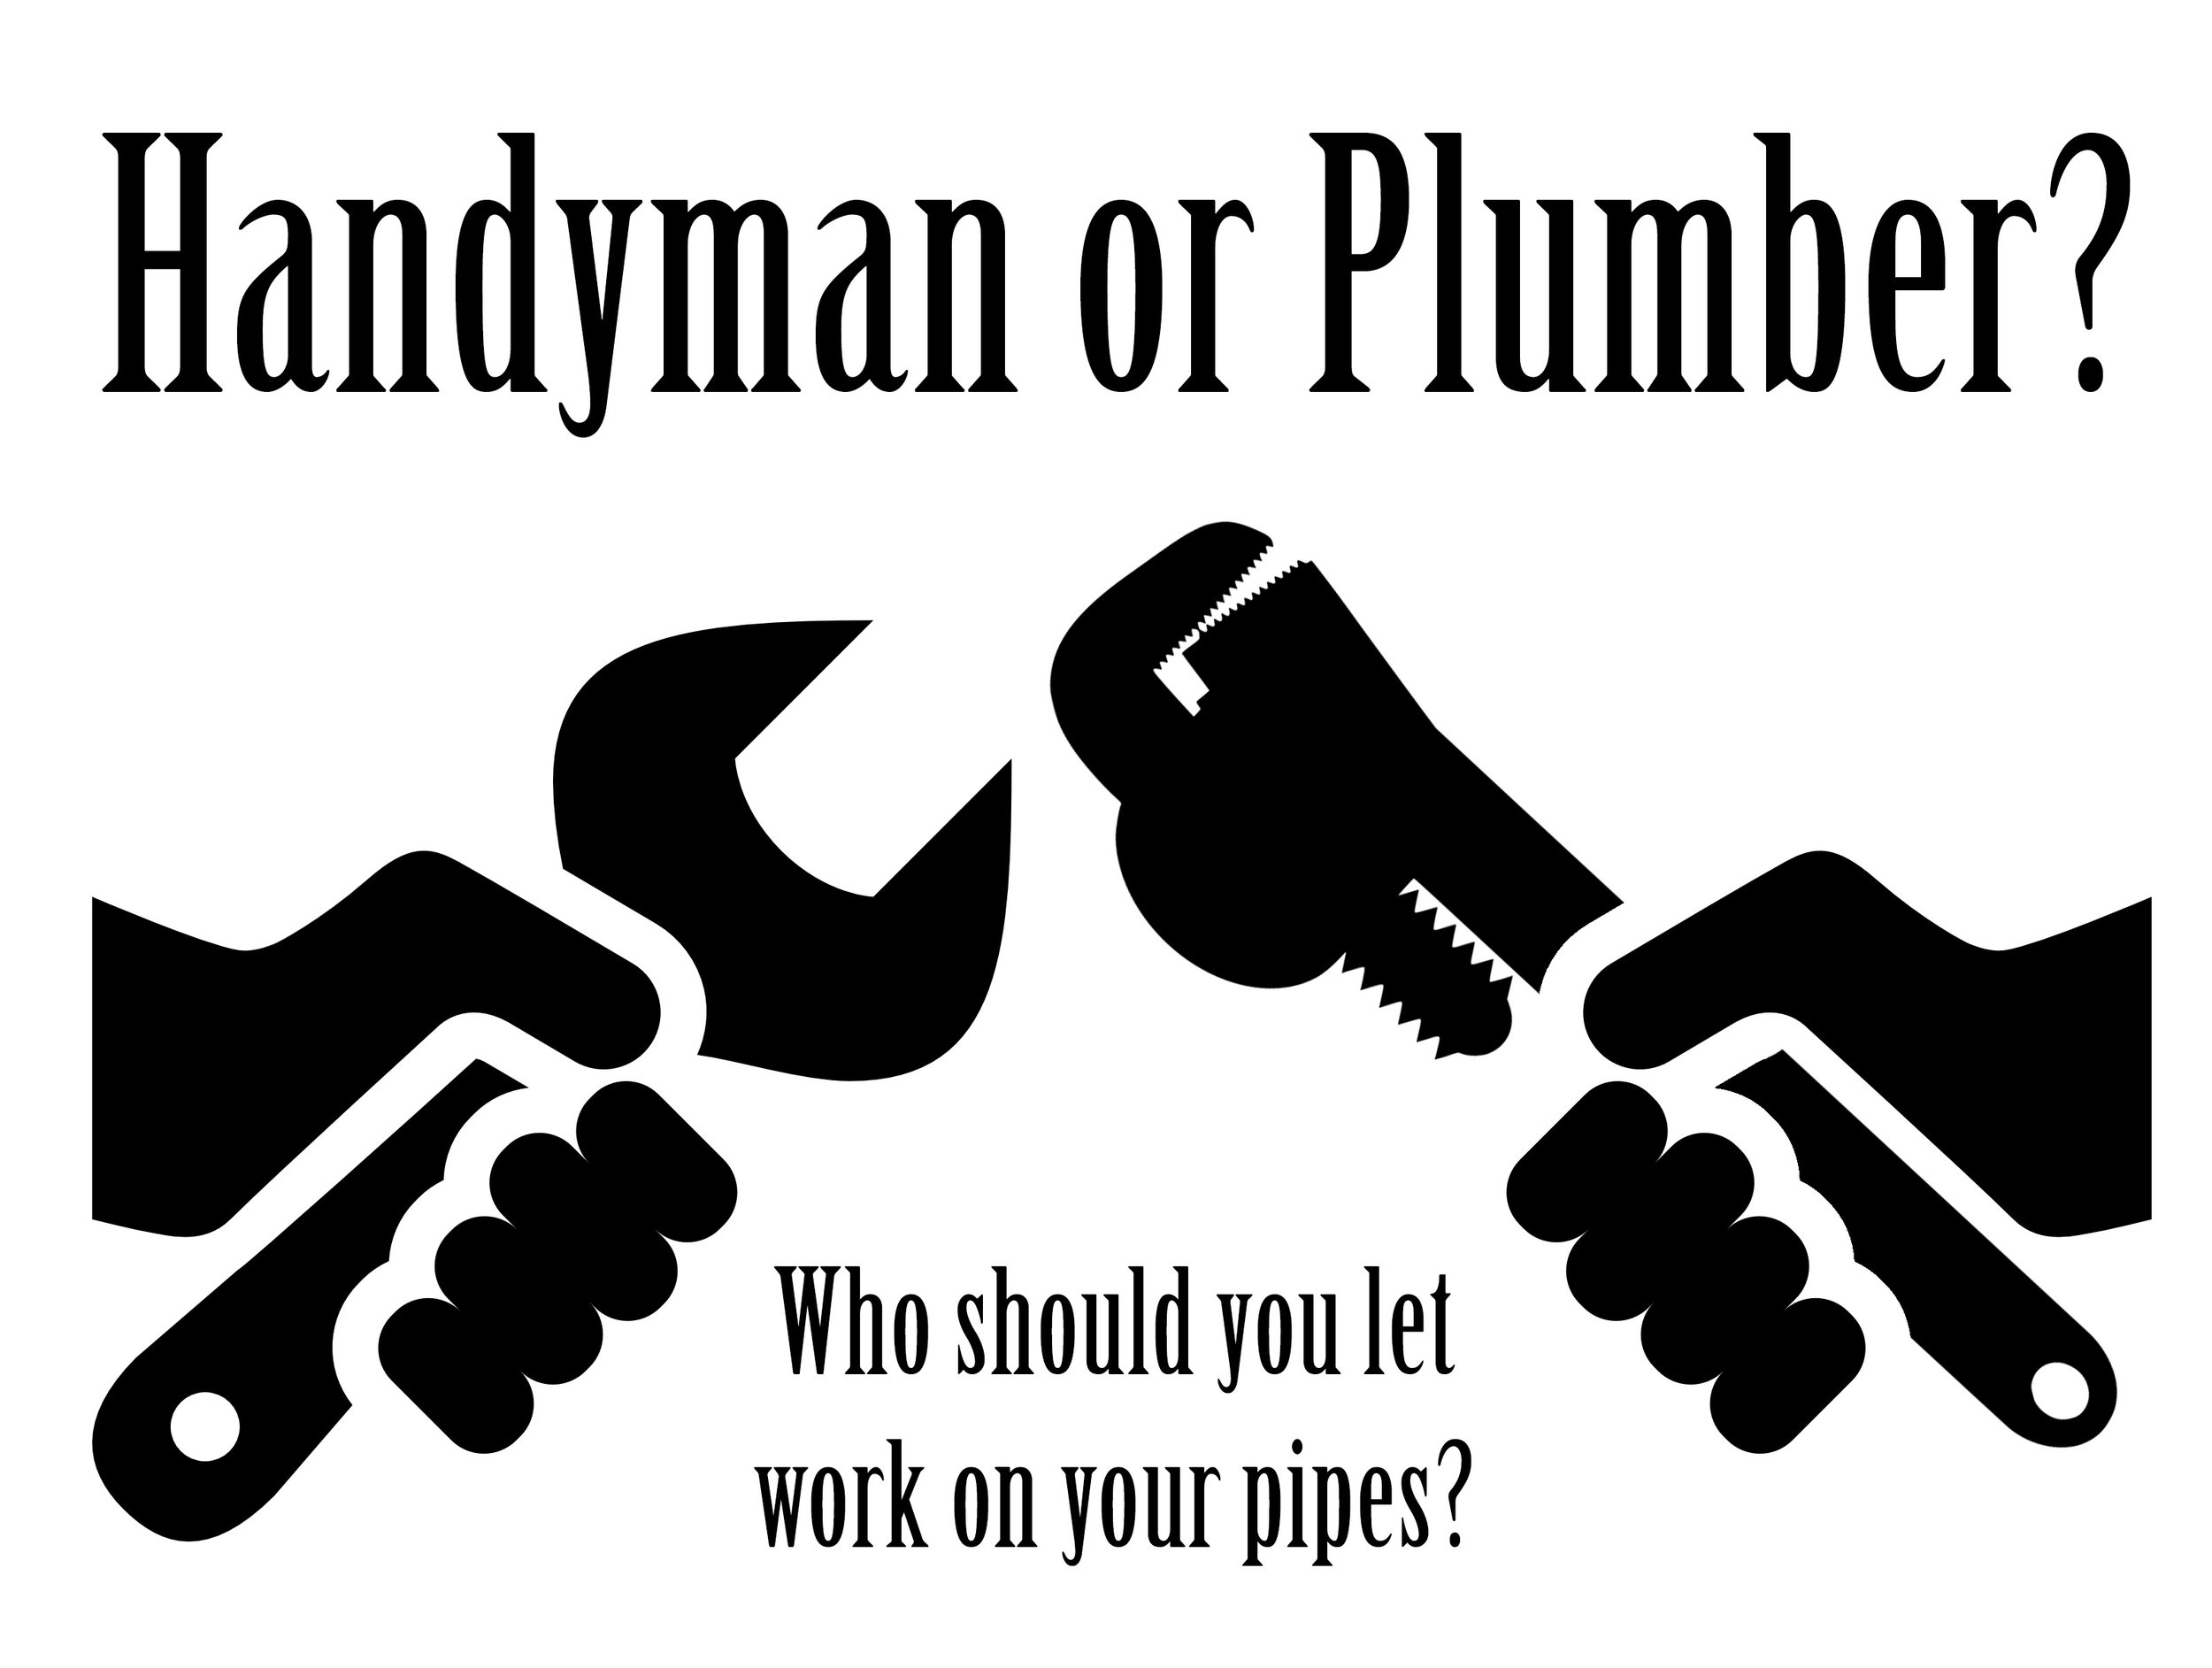 handyman-vs-plumber-no-logo.jpg